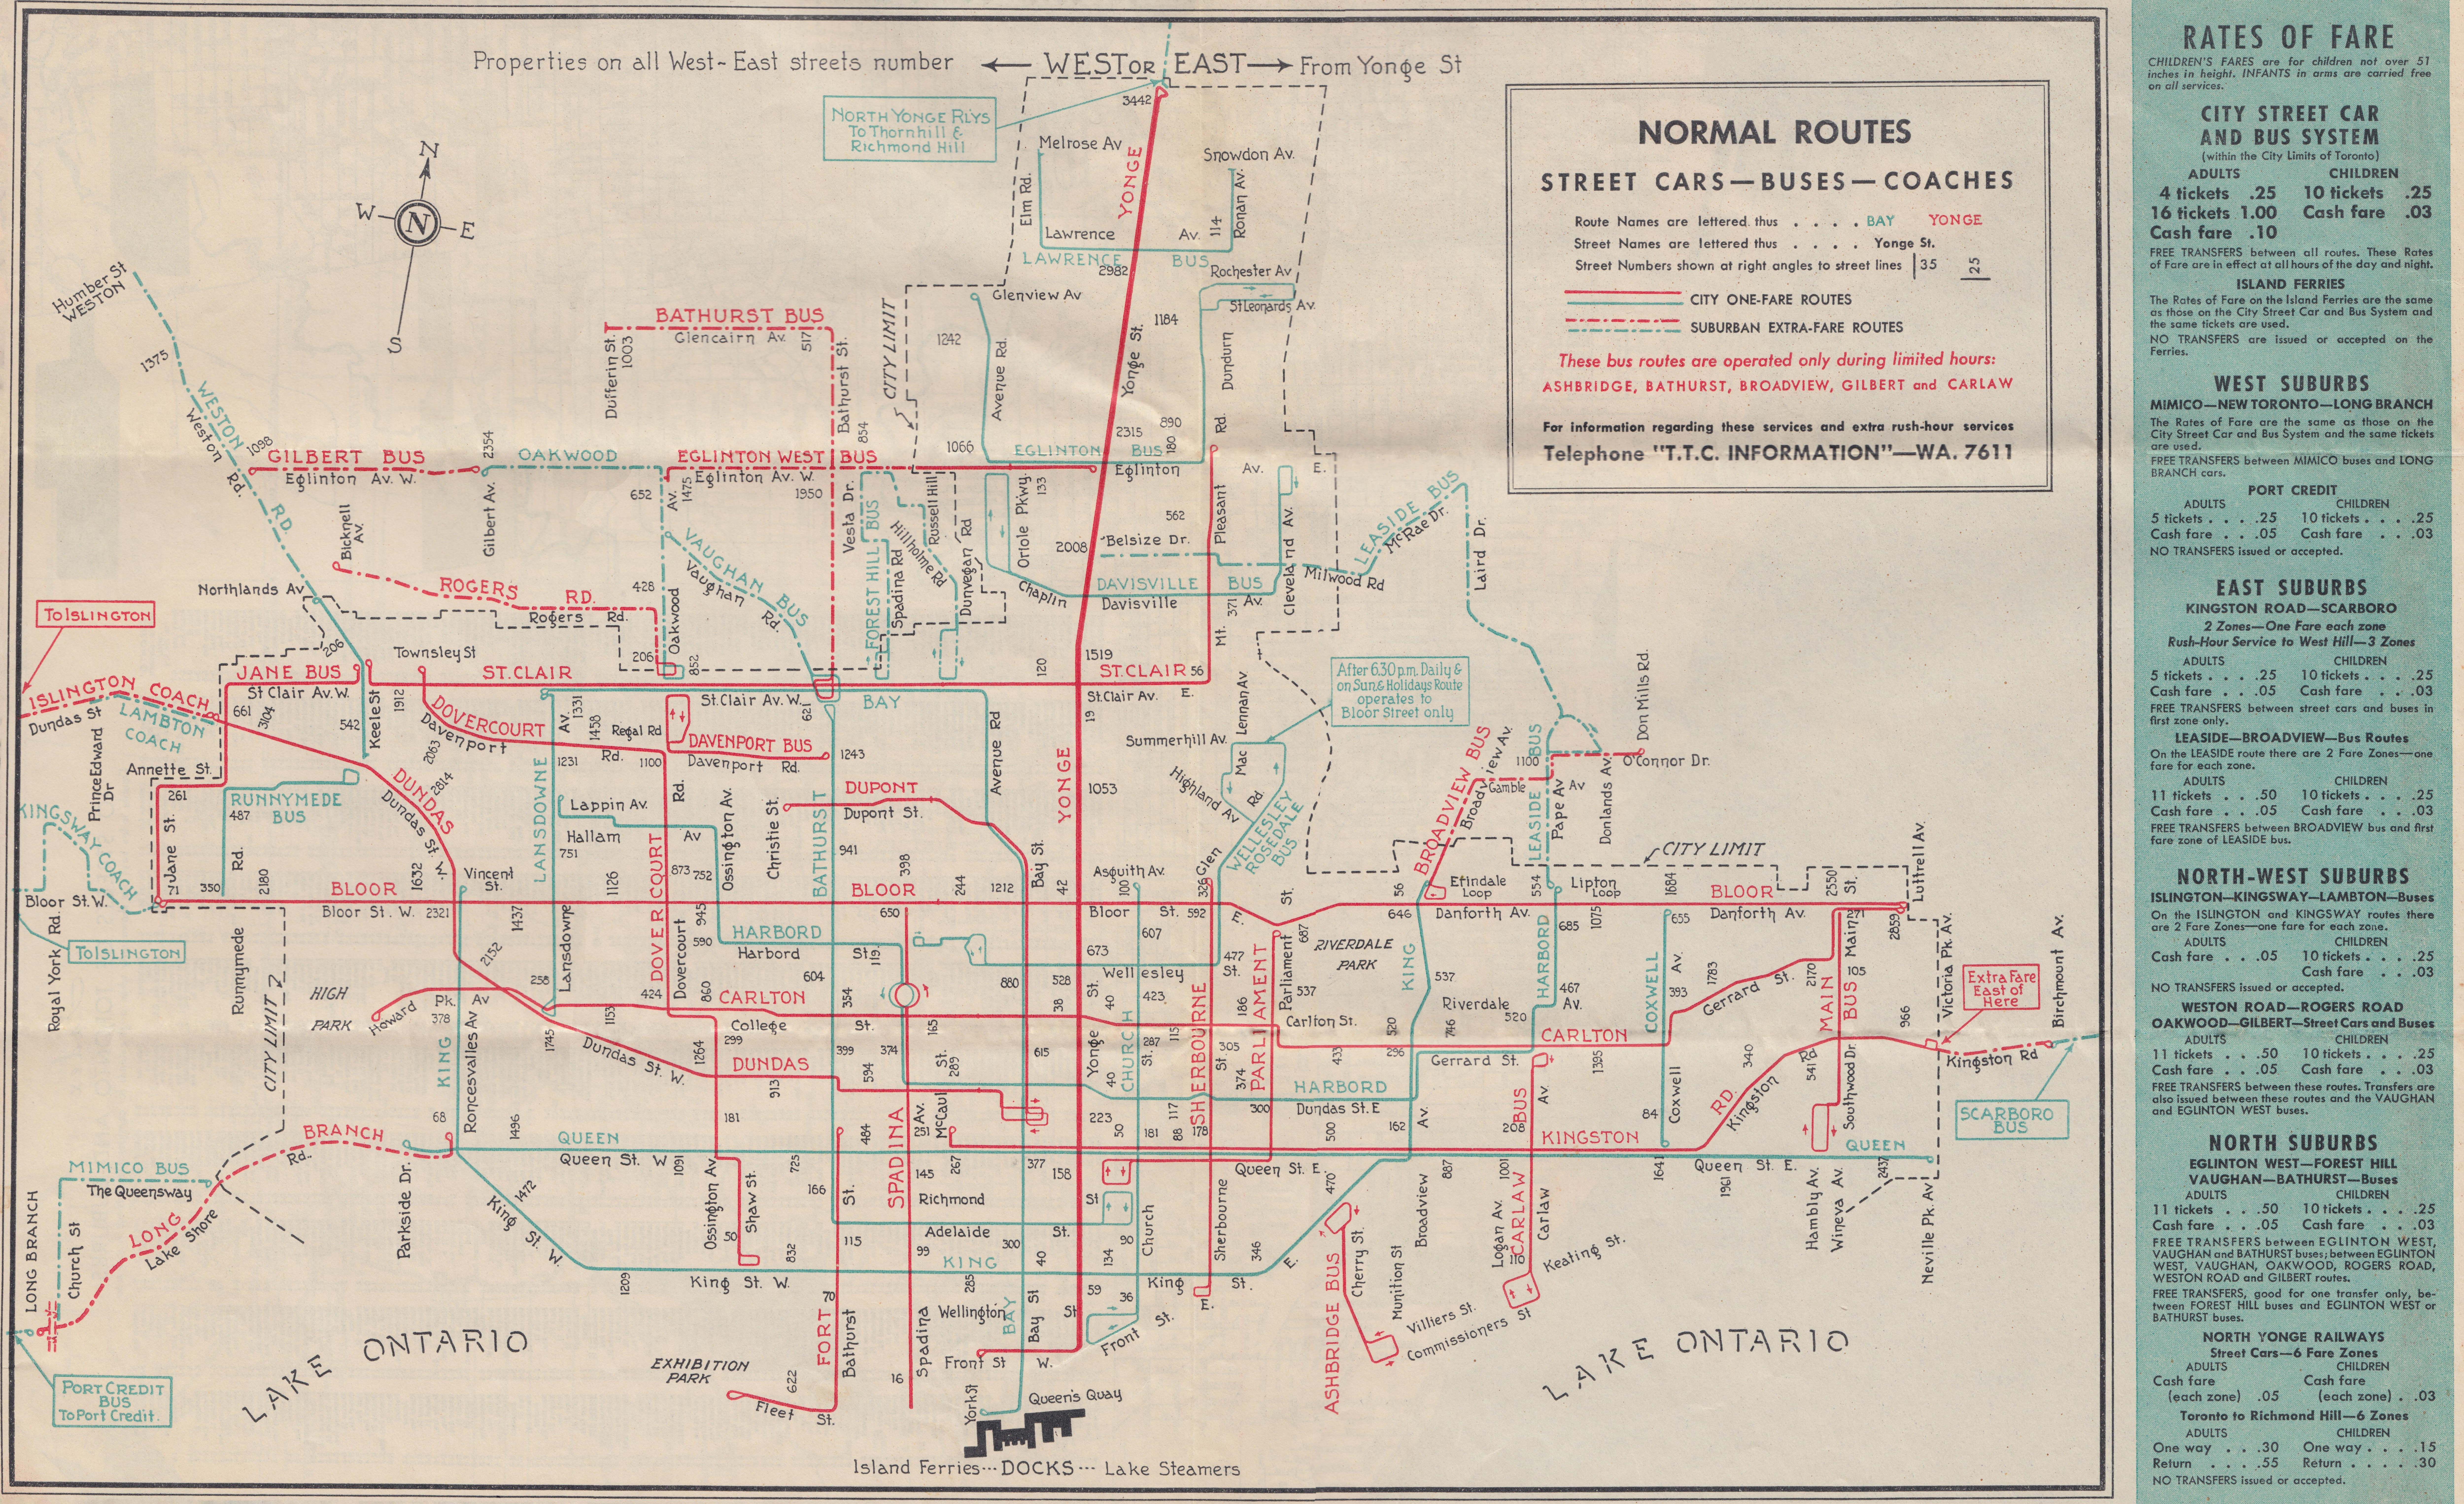 New York City Subway Map December 1999.Ttc System Maps Transit Toronto Content